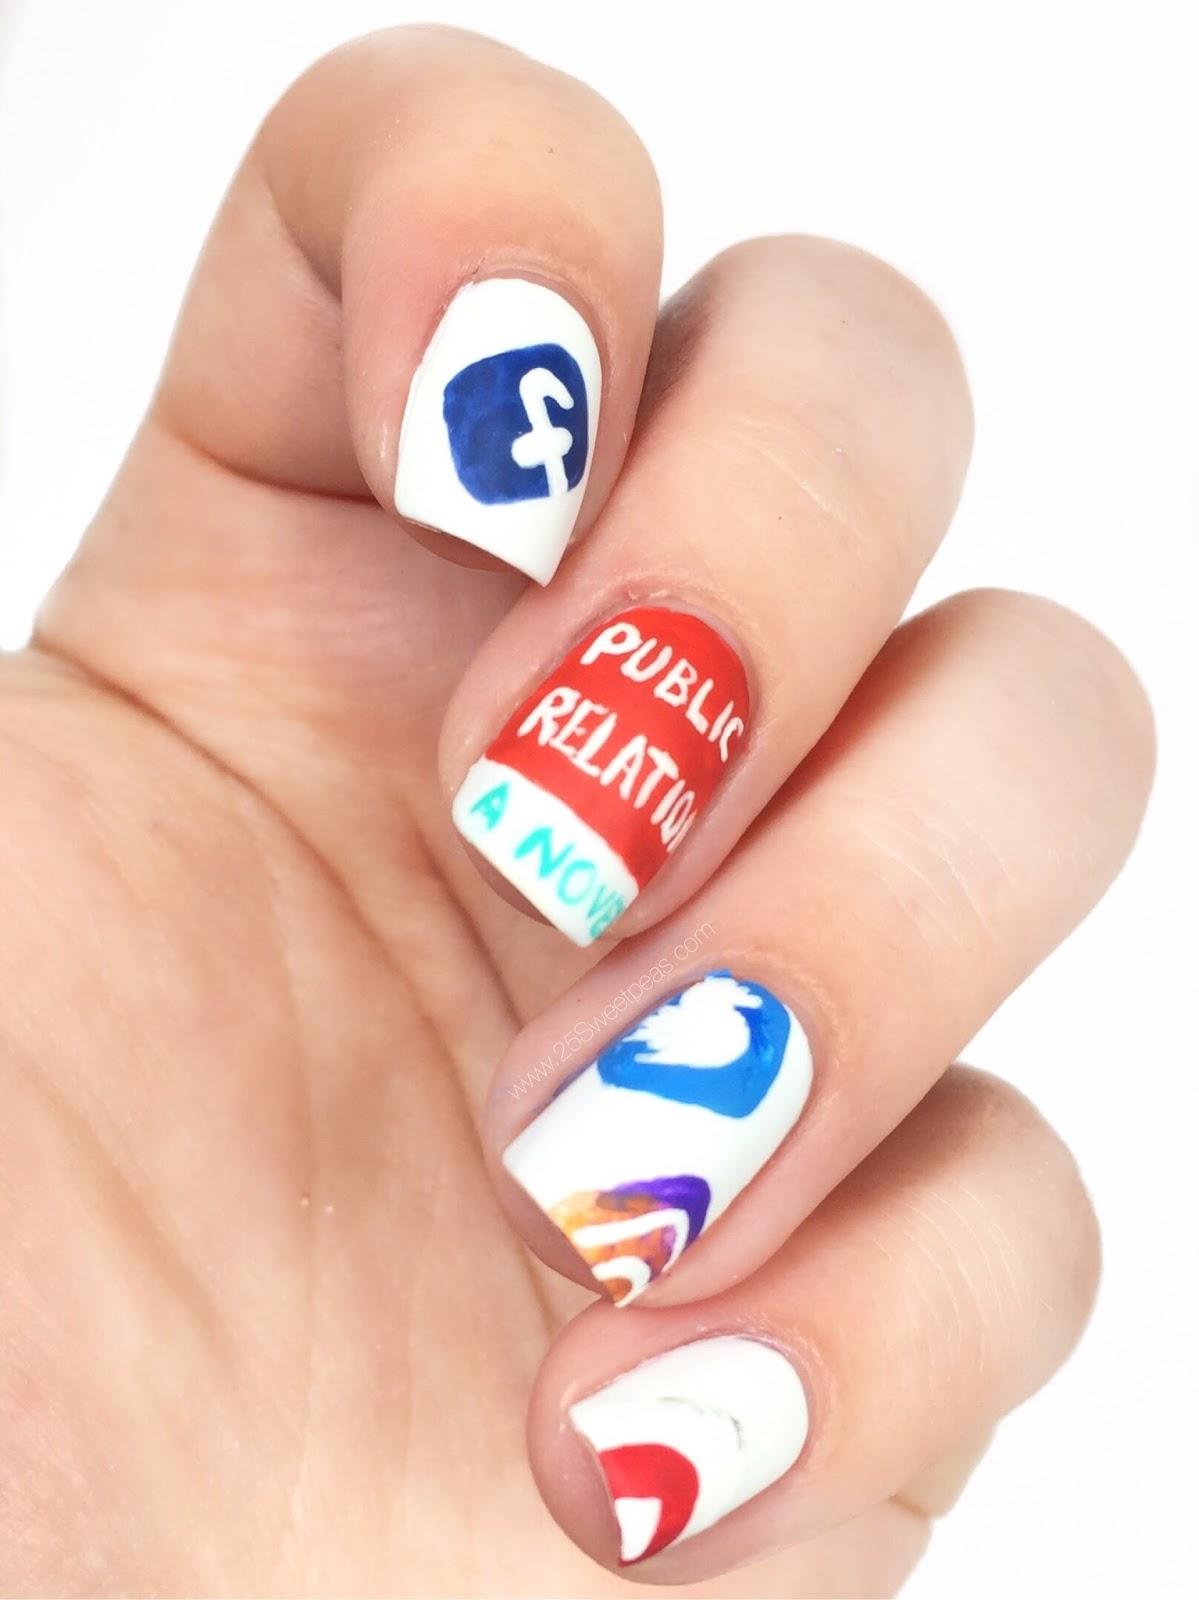 Public Relations Nail Art